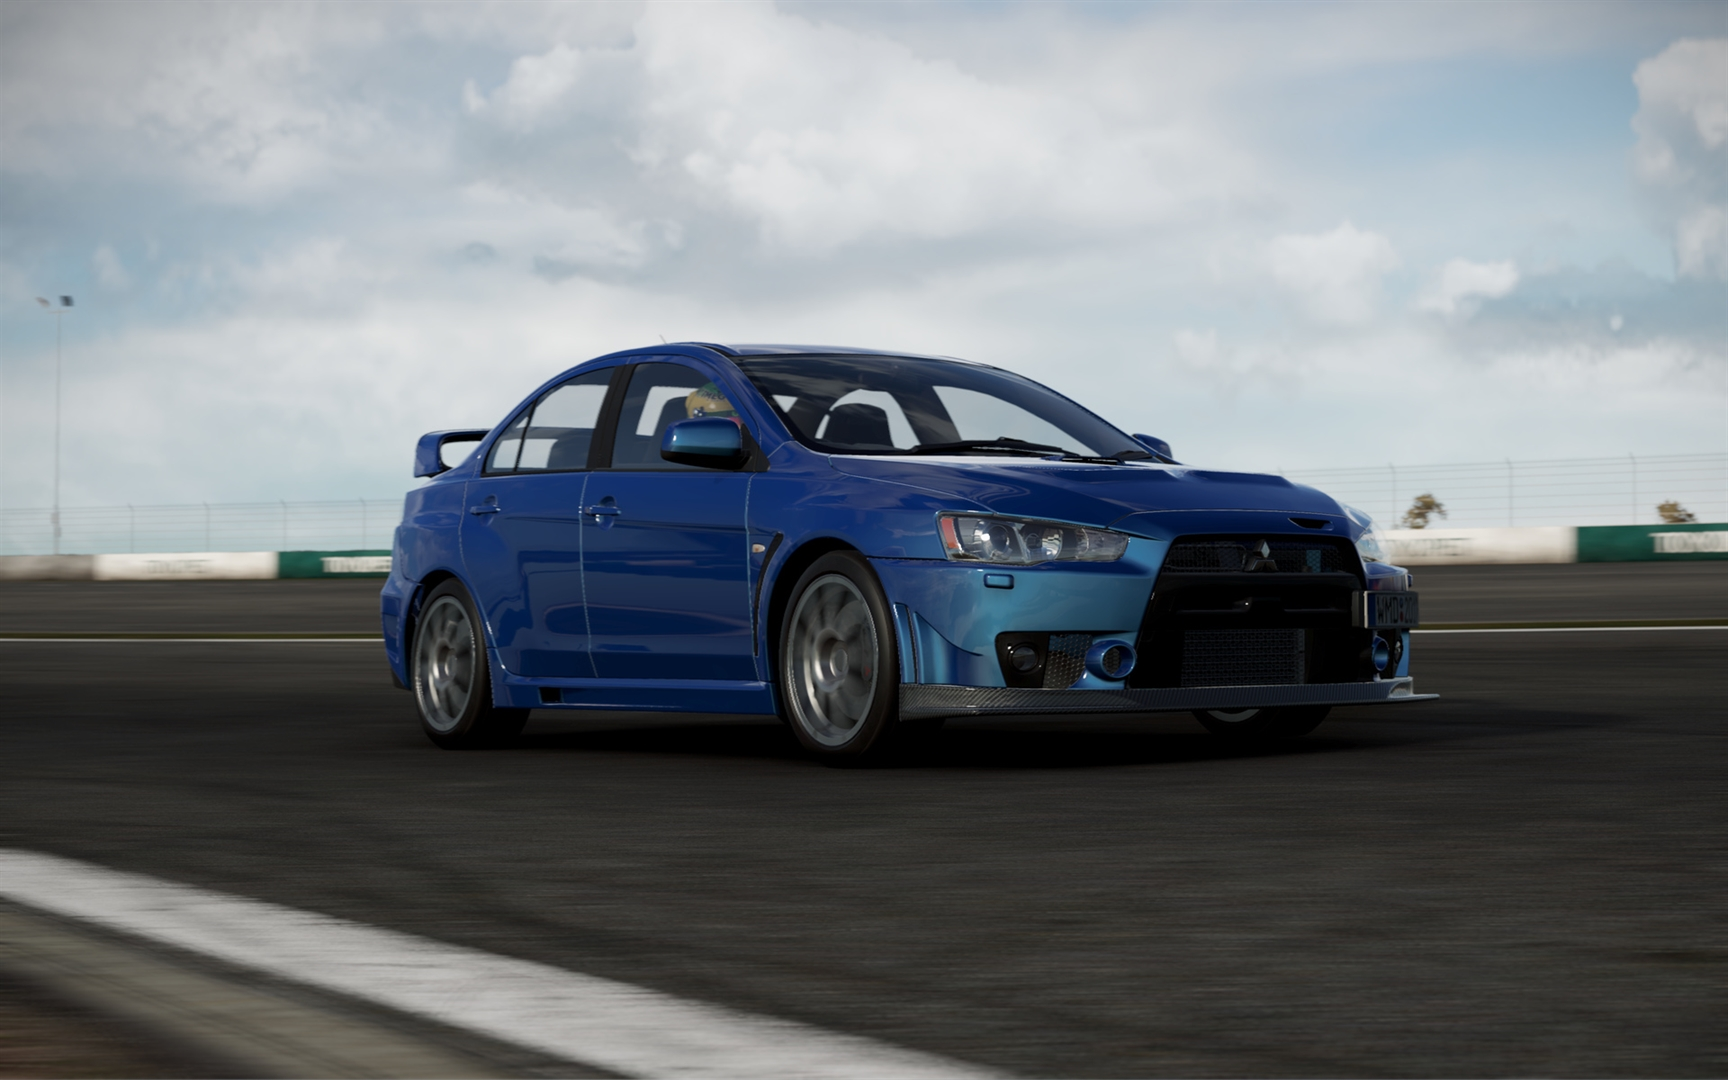 New Project CARS 2 Screenshots > GamersBook